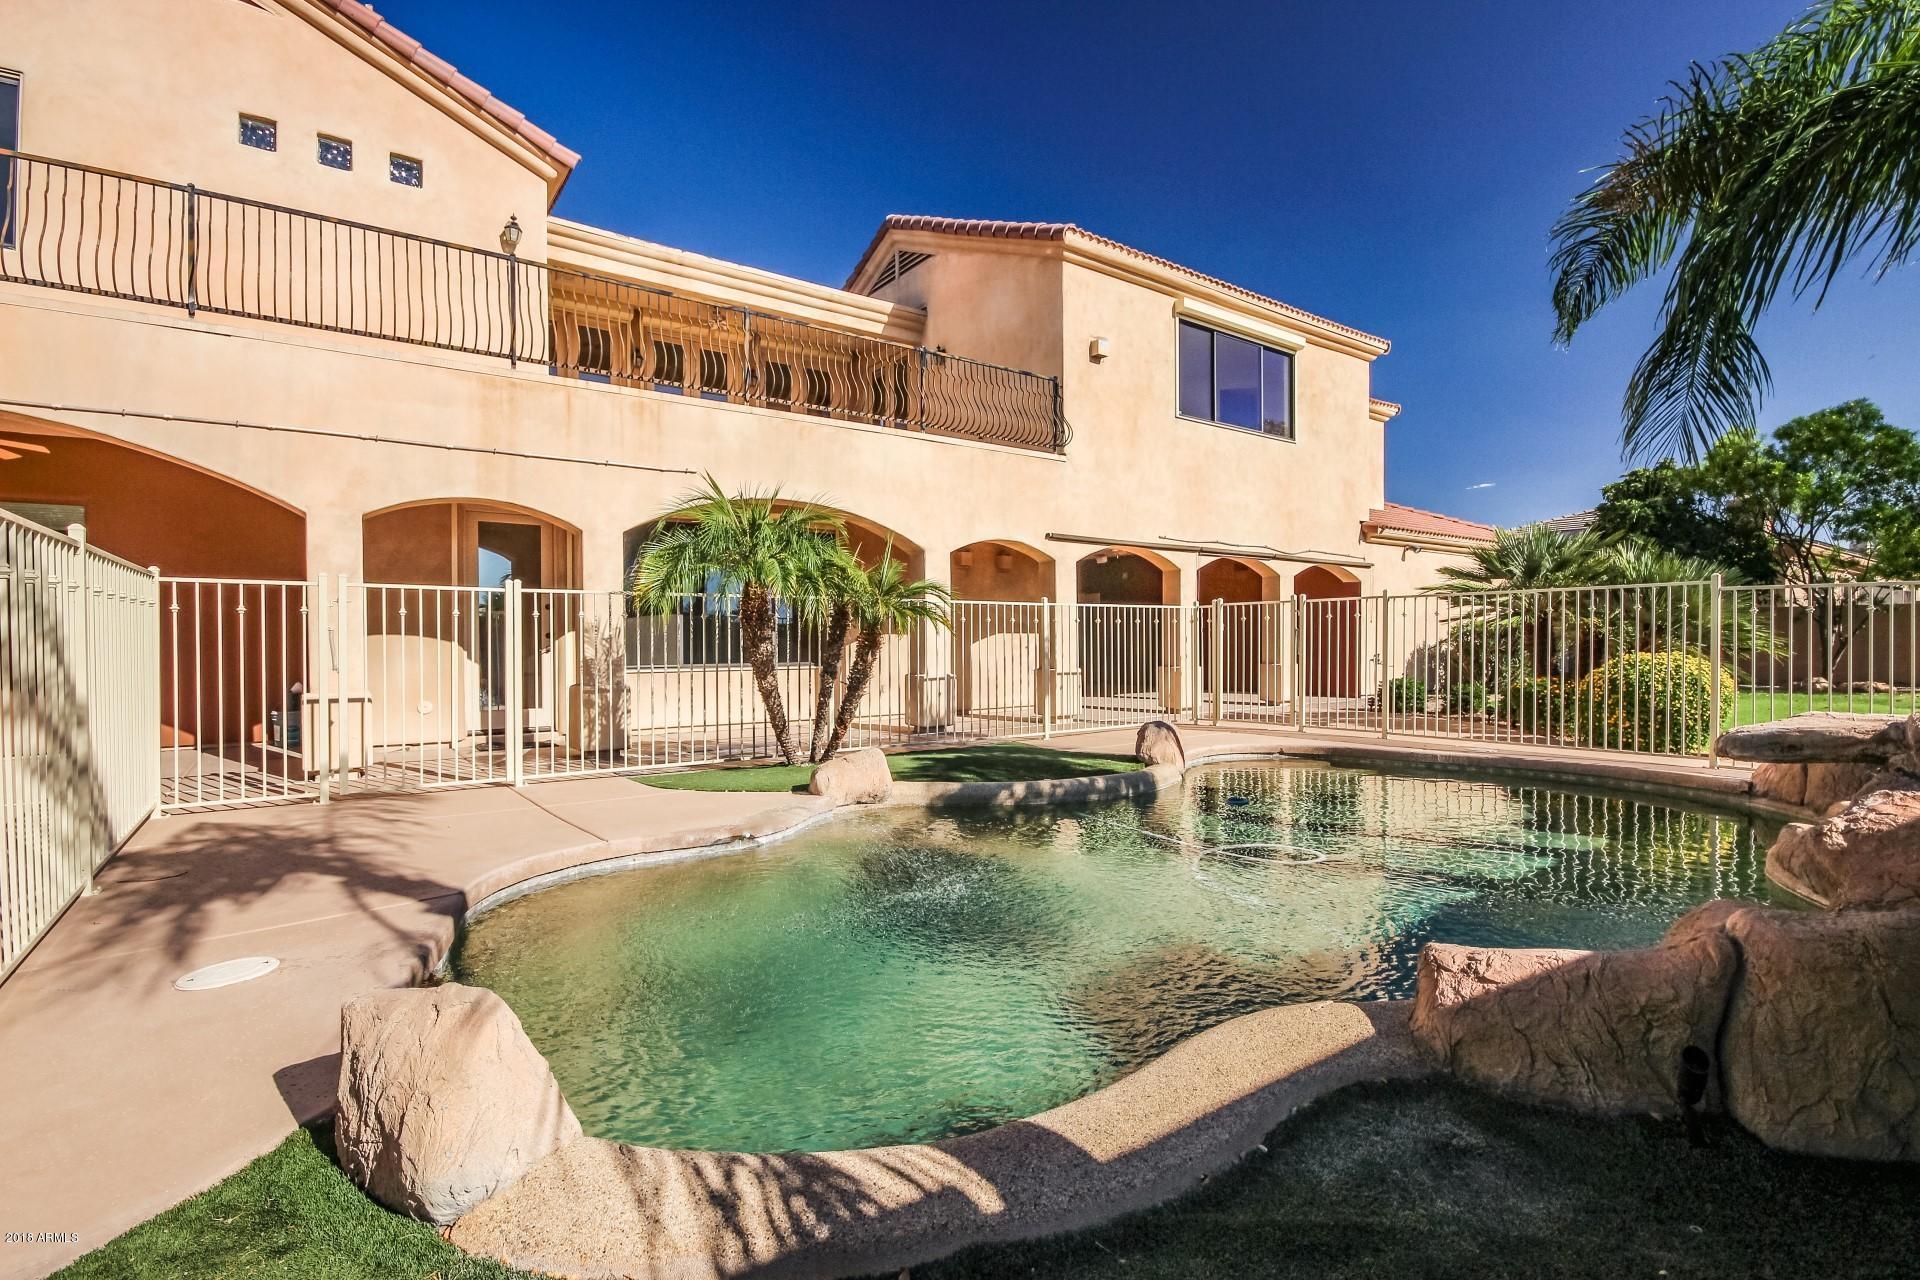 MLS 5796318 4922 N GREENTREE Drive, Litchfield Park, AZ 85340 Litchfield Park AZ Mountain View